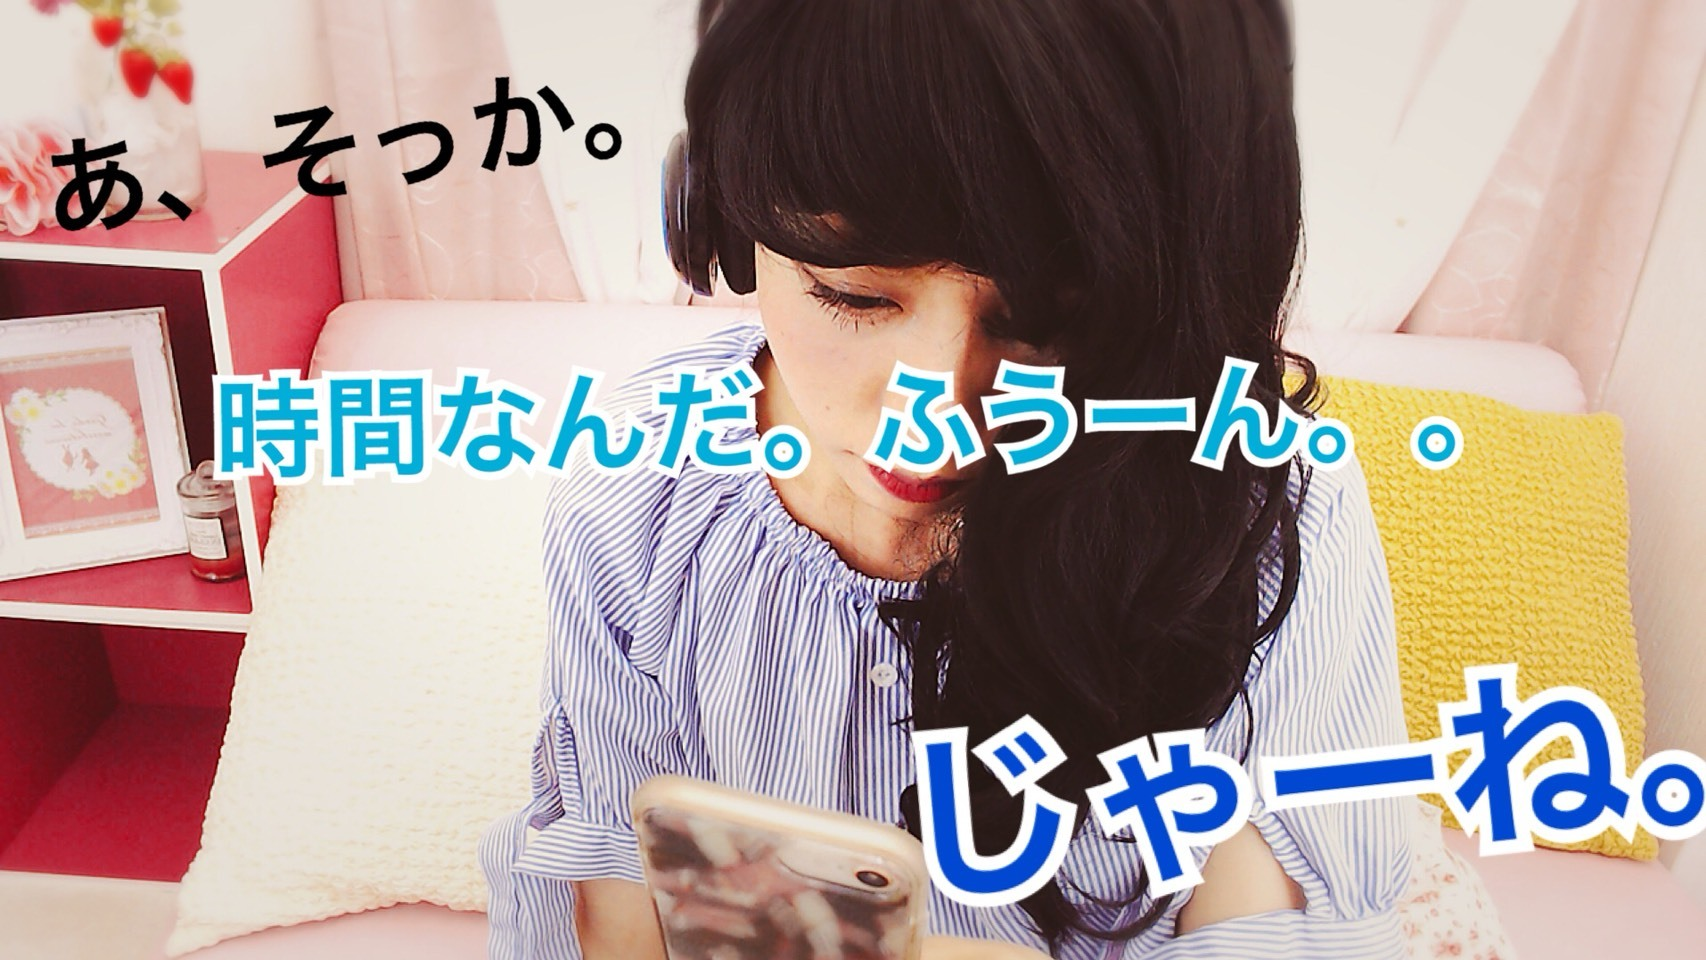 S__15736836.jpg